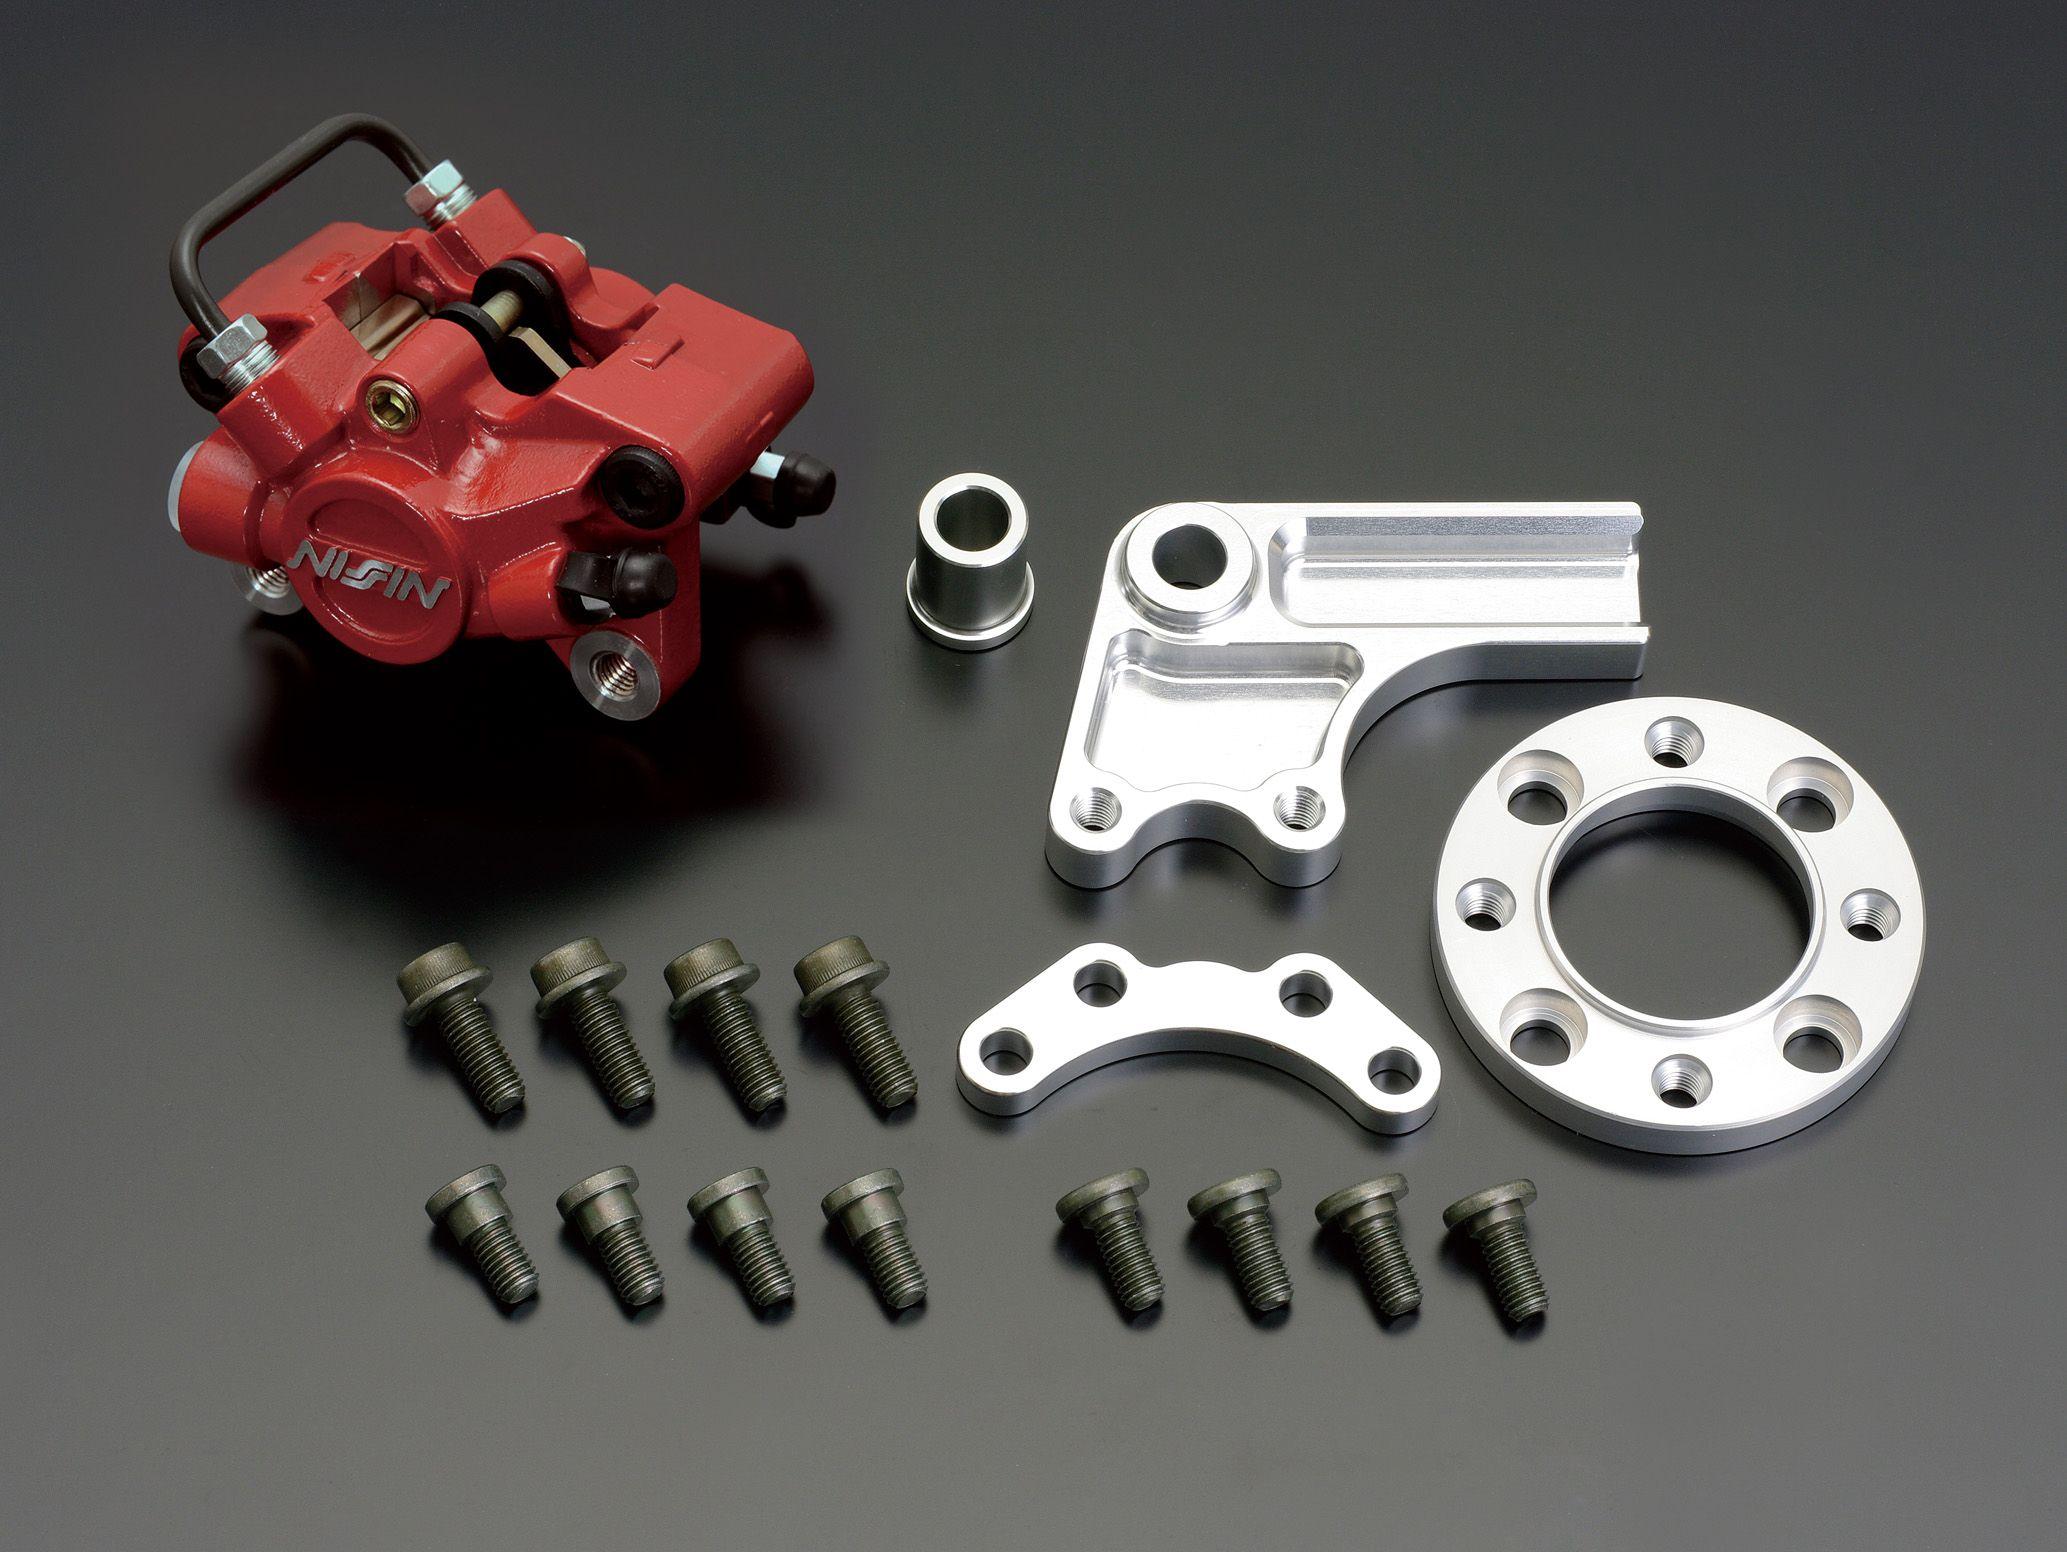 NISSIN 2POT 紅色煞車卡鉗 後碟煞套件